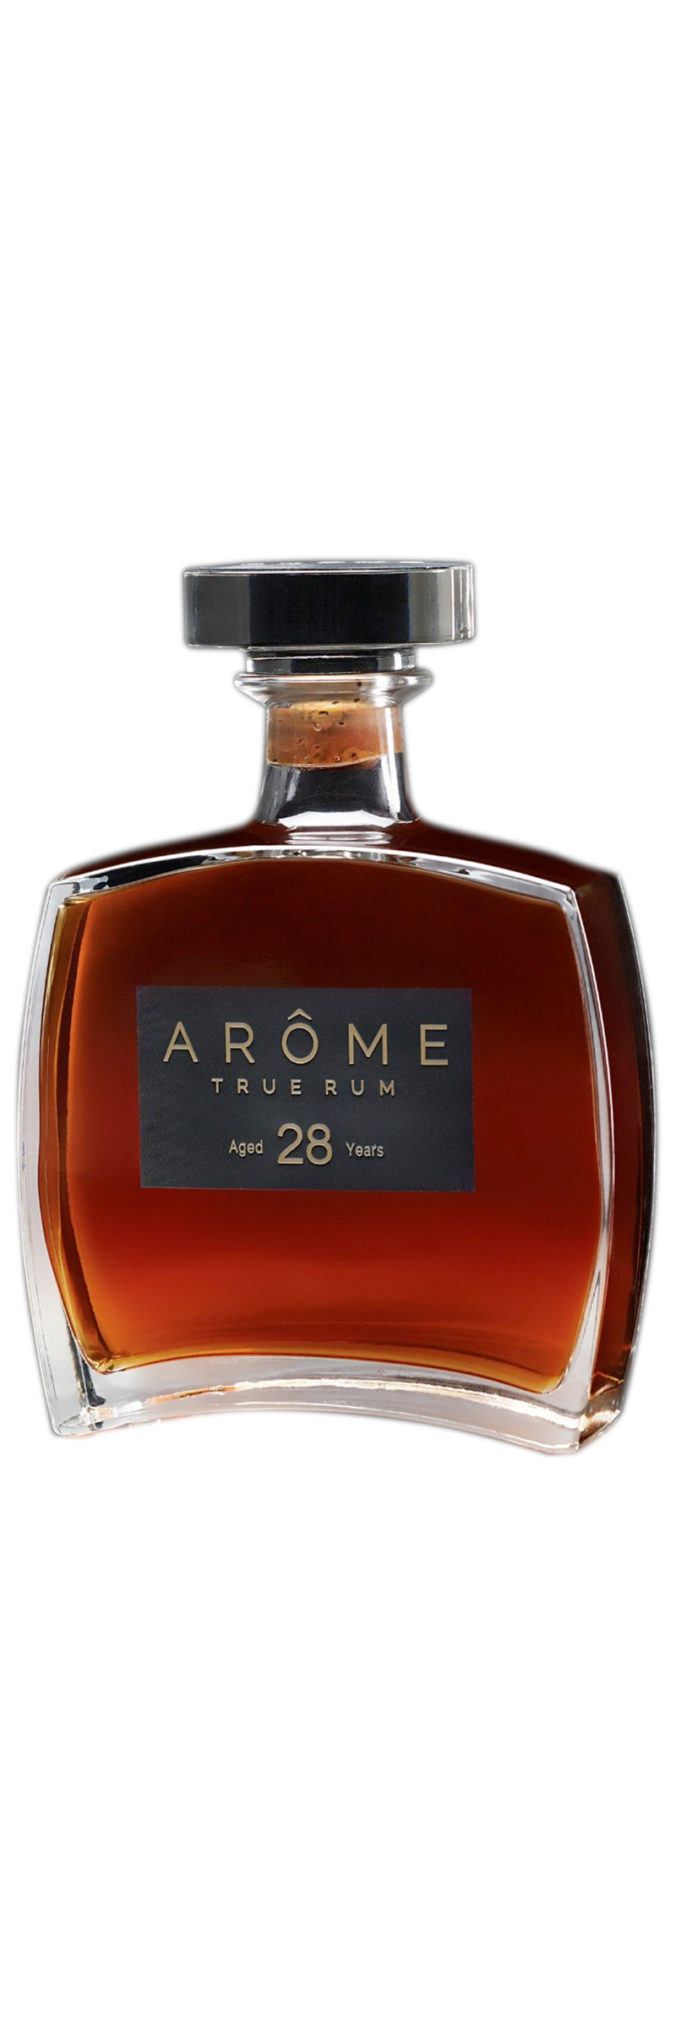 Rum Arôme, Rum Arome, luxury rum, limited edition, Panama